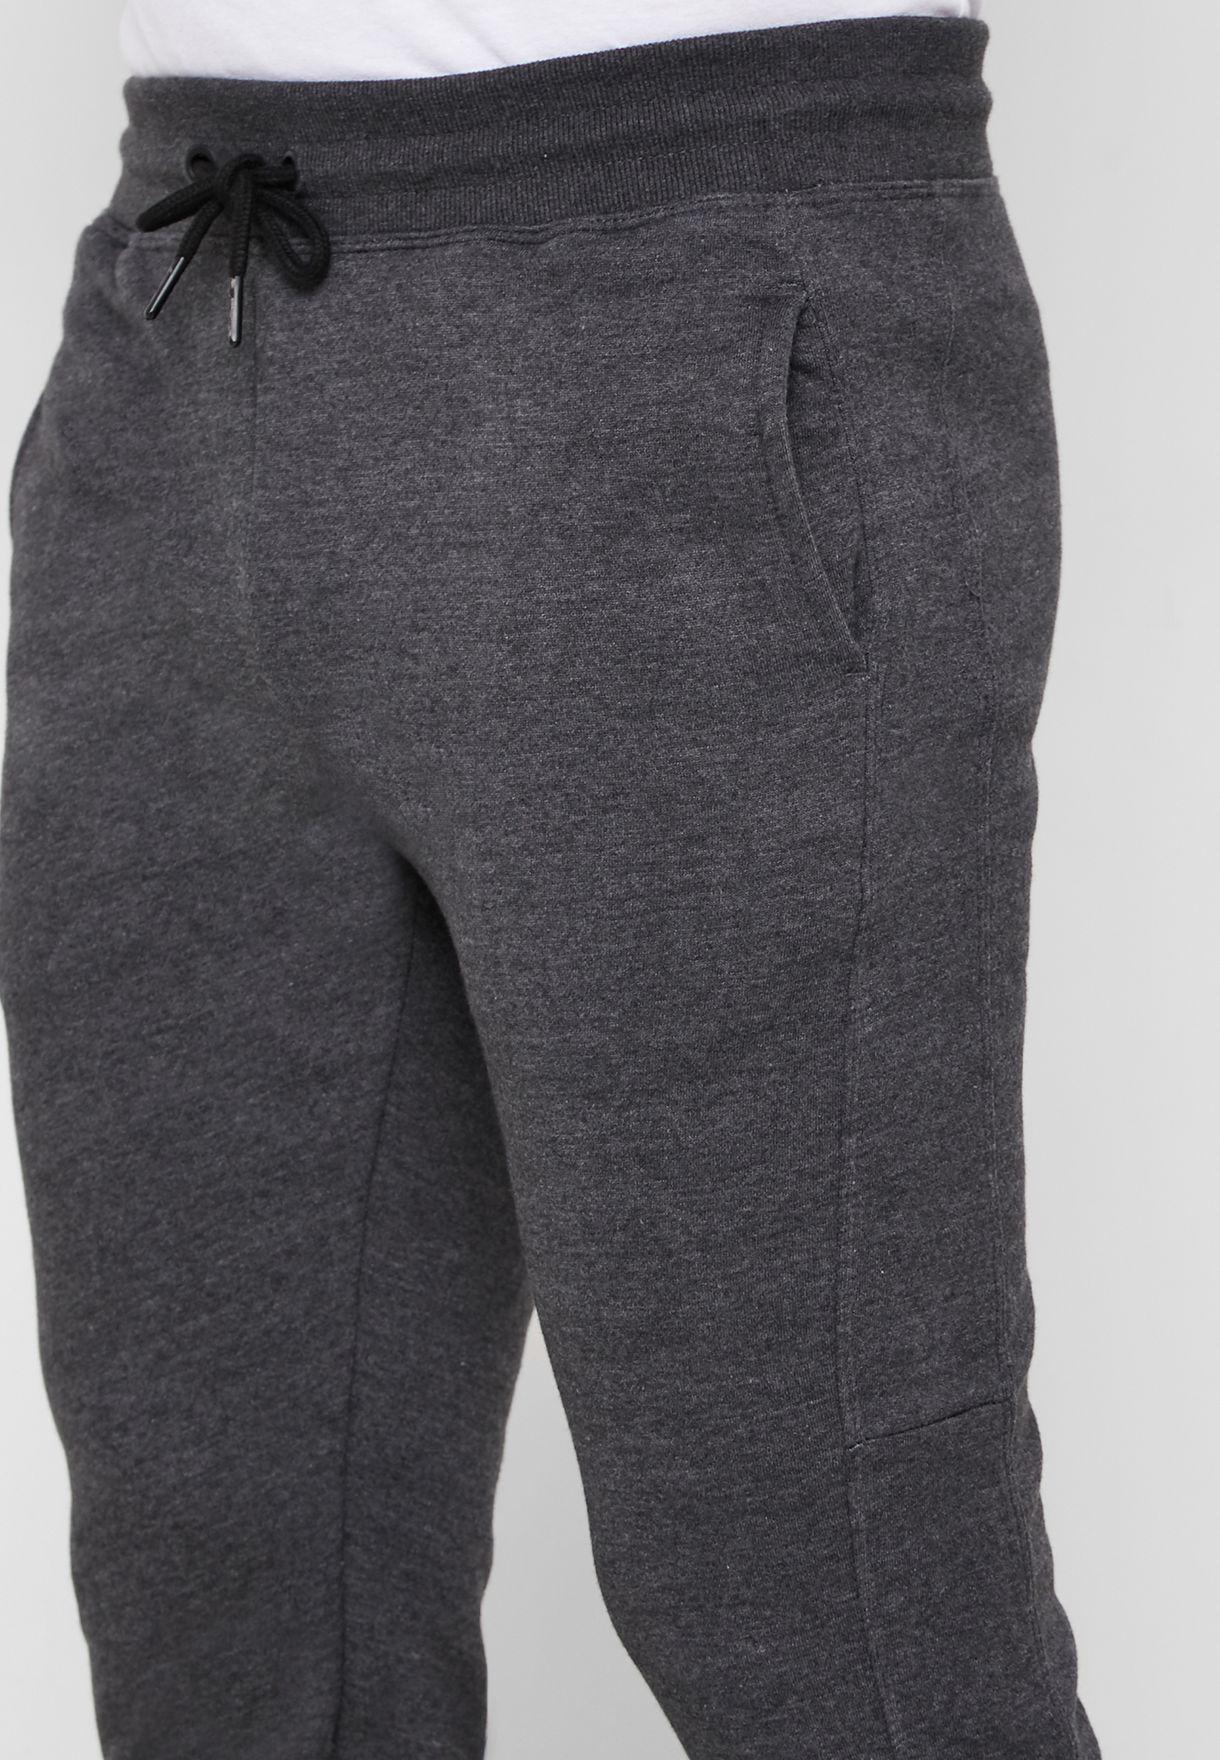 Textured Cuffed Sweatpants